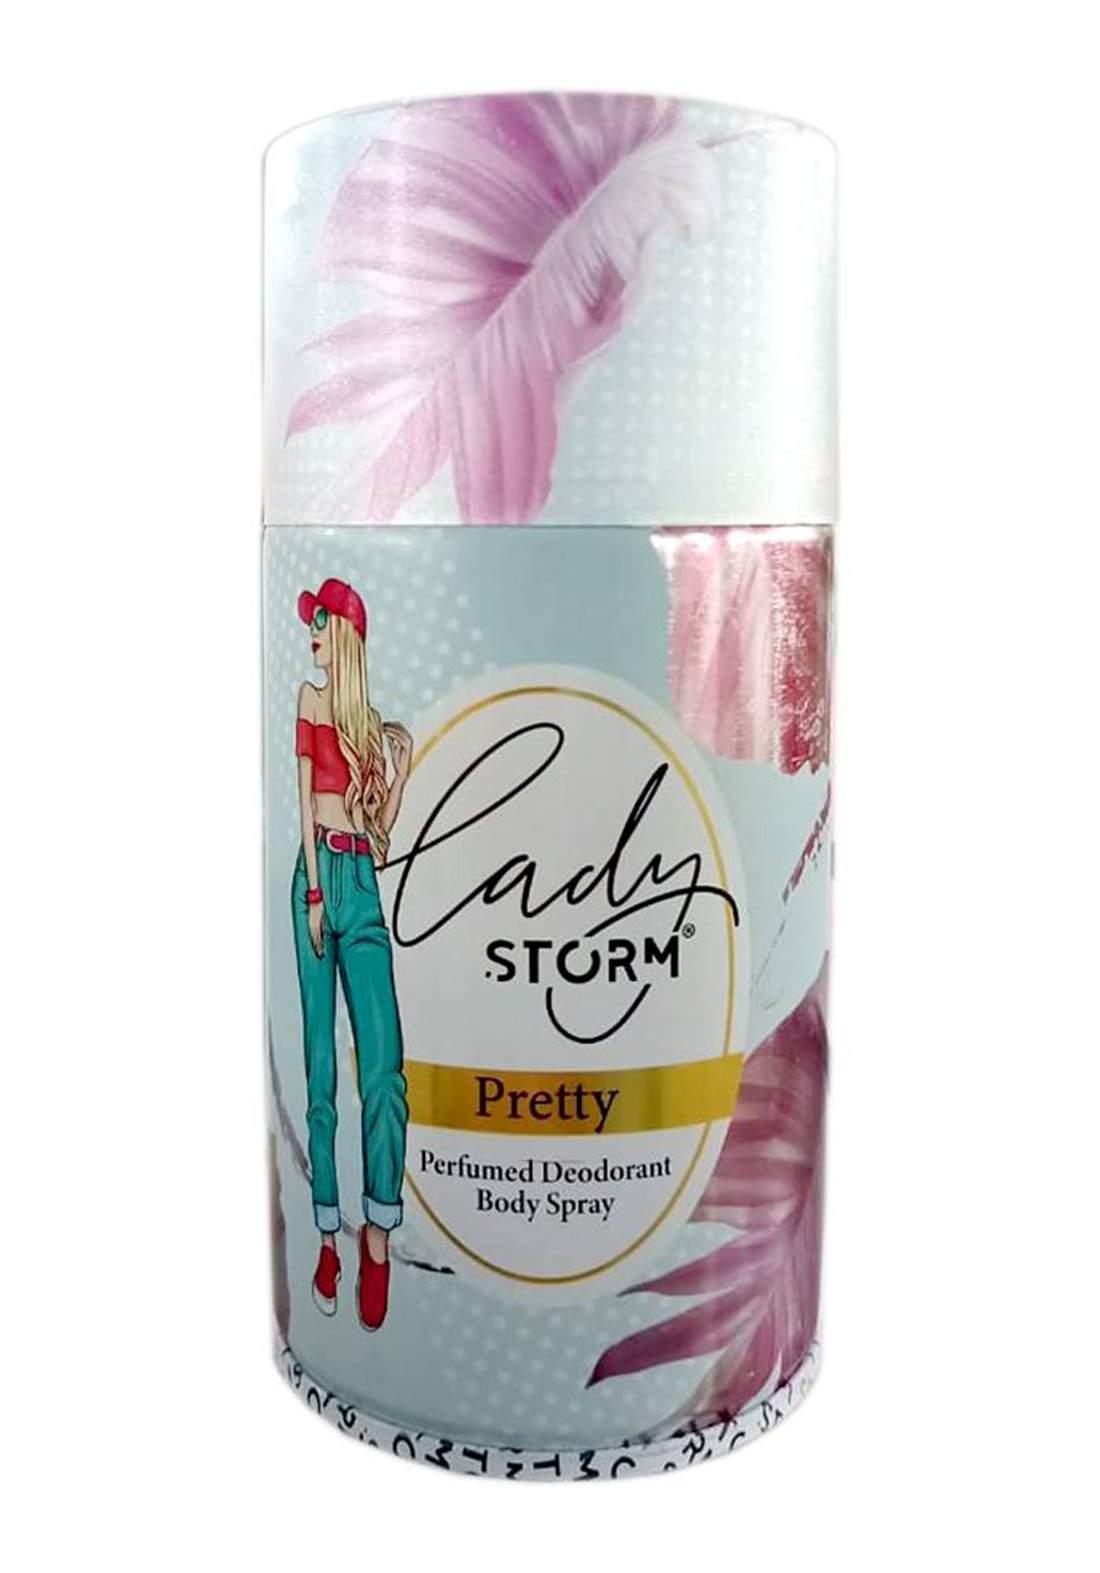 Storm Lady Perfumed Deodorant Body Spray -Pretty 250ml  مزيل العرق للنساء